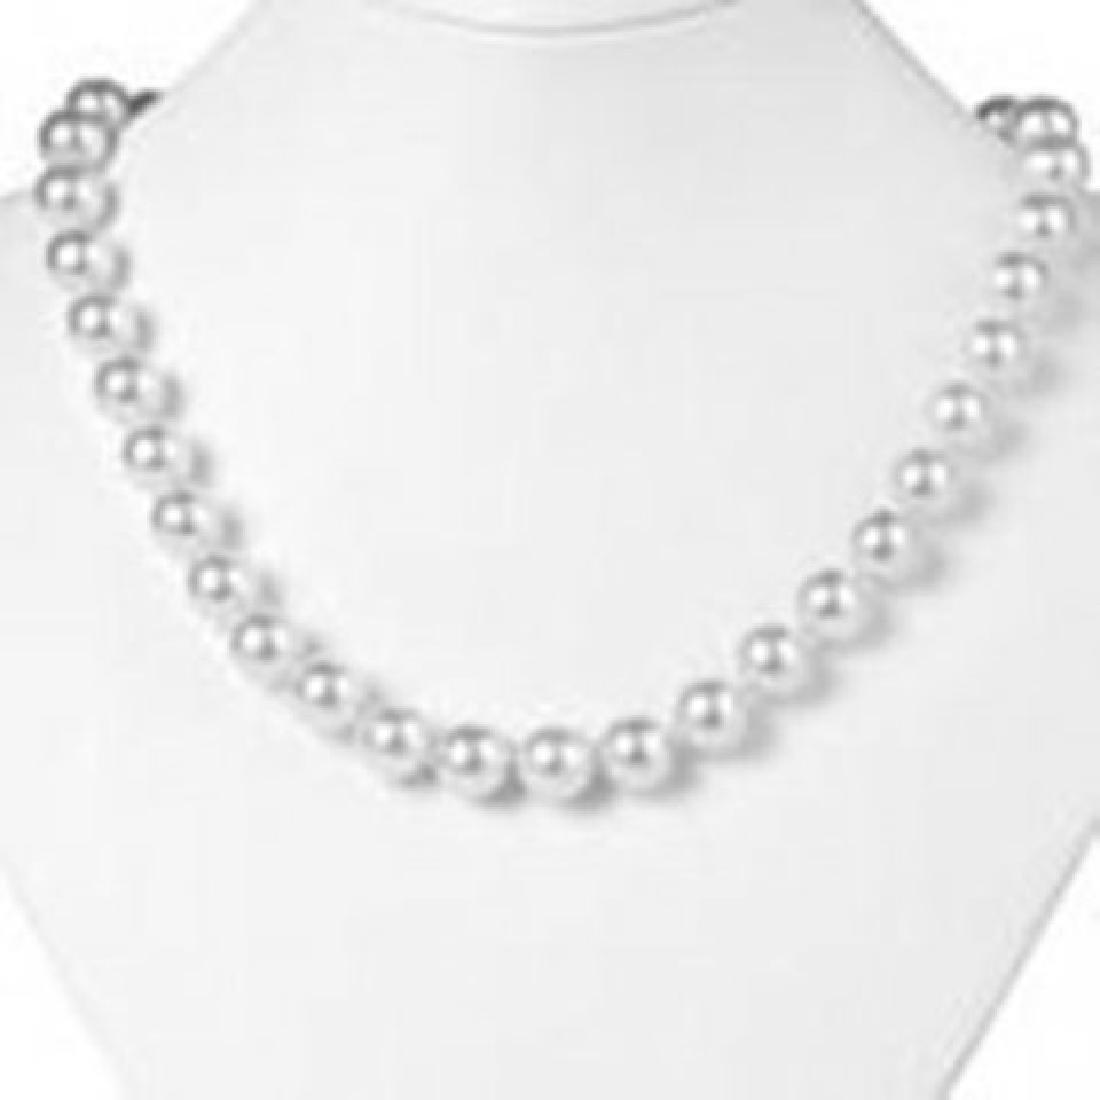 10 mm Swarovski Pearl Necklace 14k W/g Gold/ Filled - 2